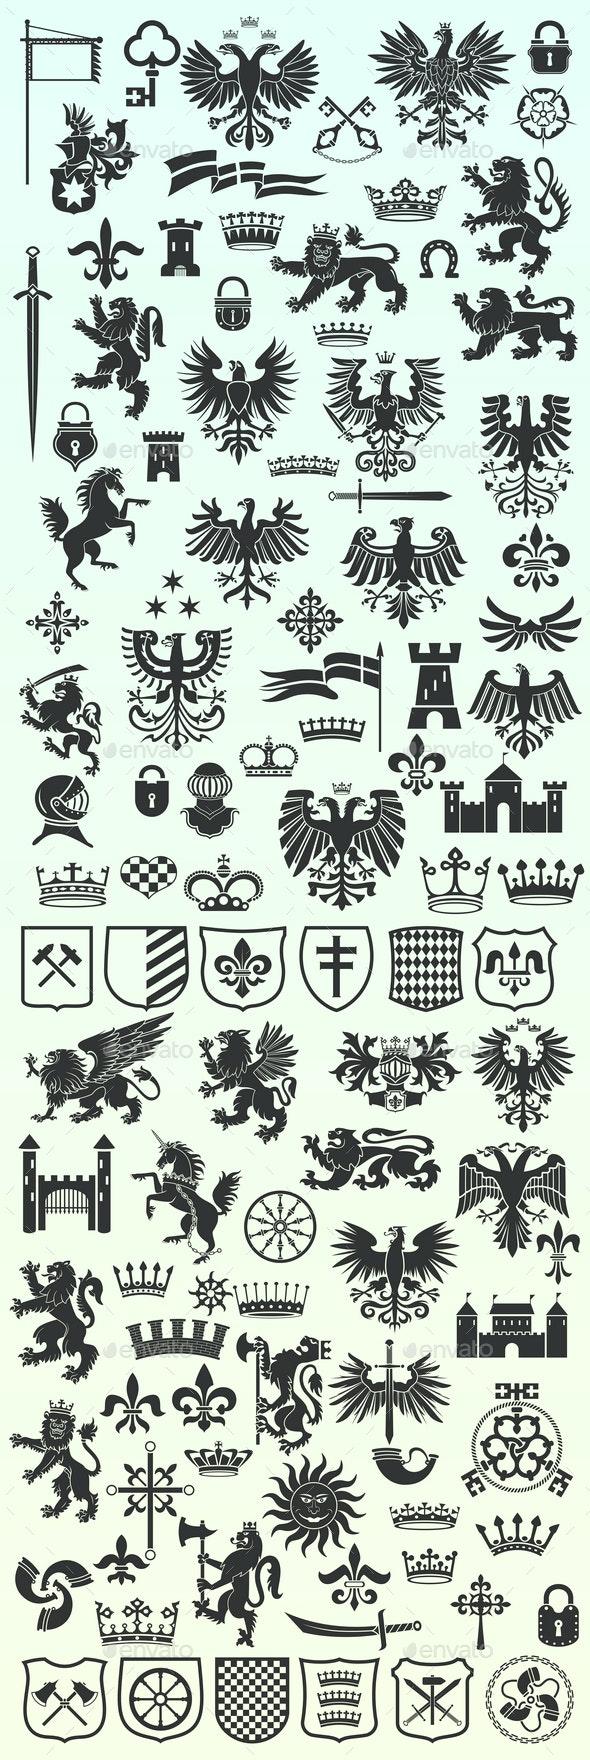 Set of Heraldic Design Elements